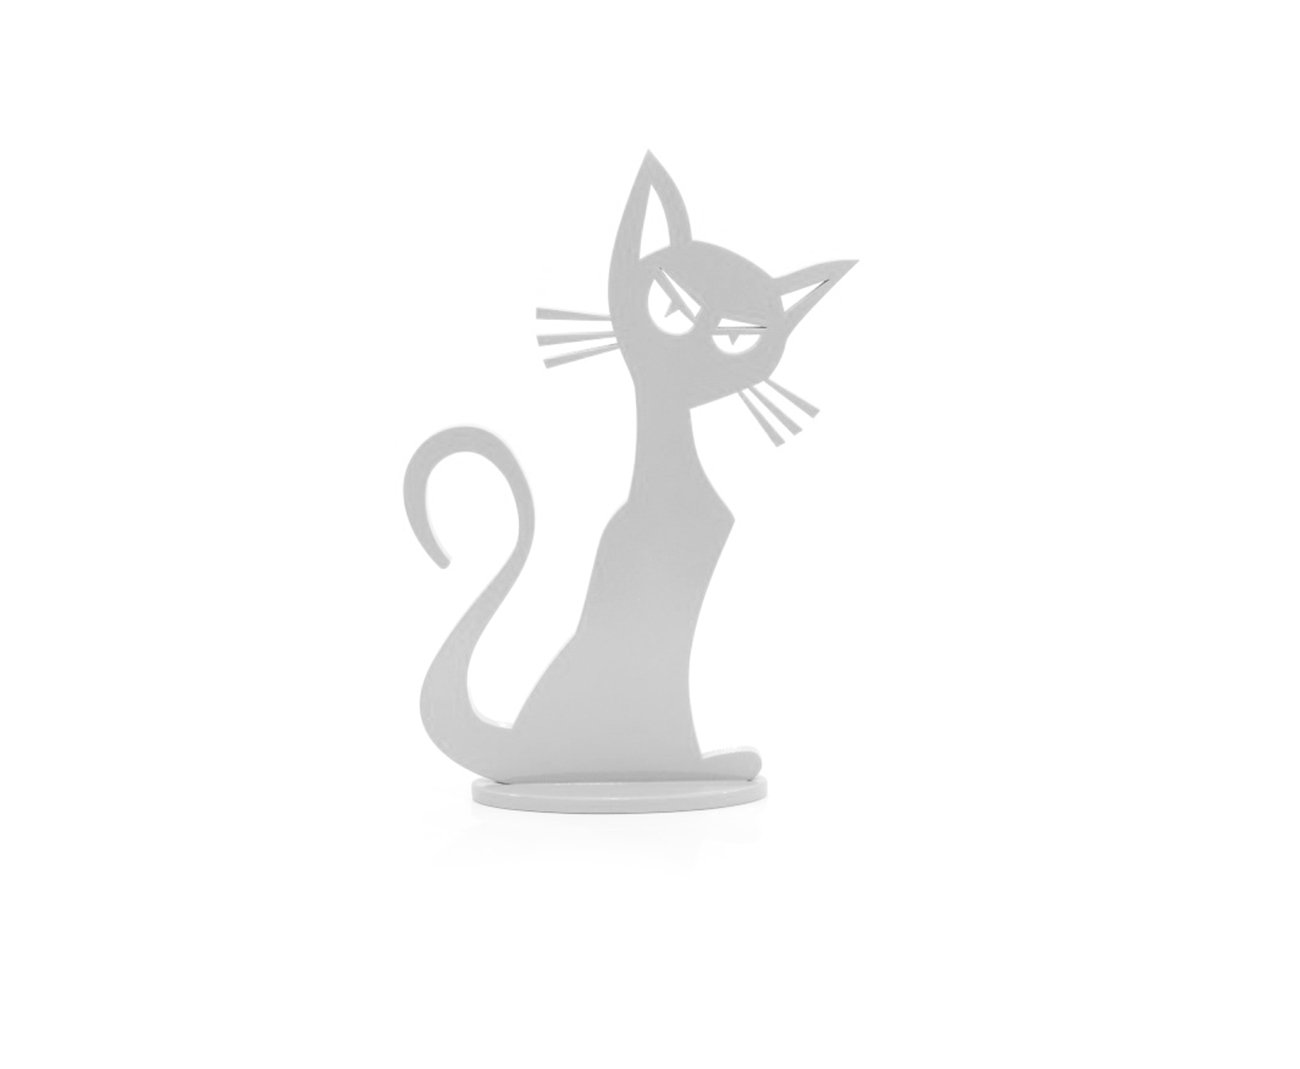 Adorno Gato Mod 02 Branco - Geton